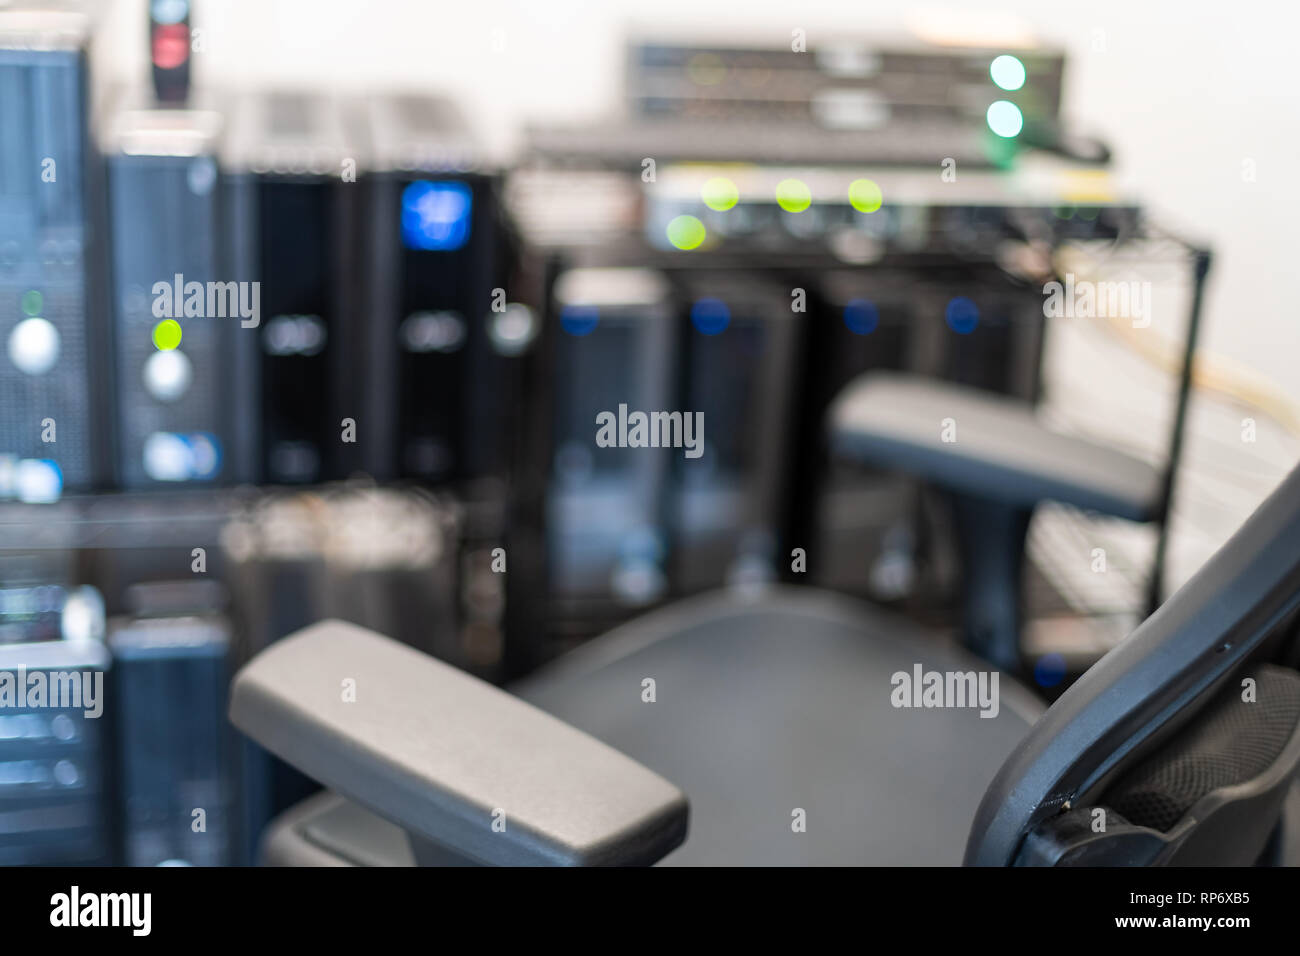 Computer servers lights photos & computer servers lights images alamy